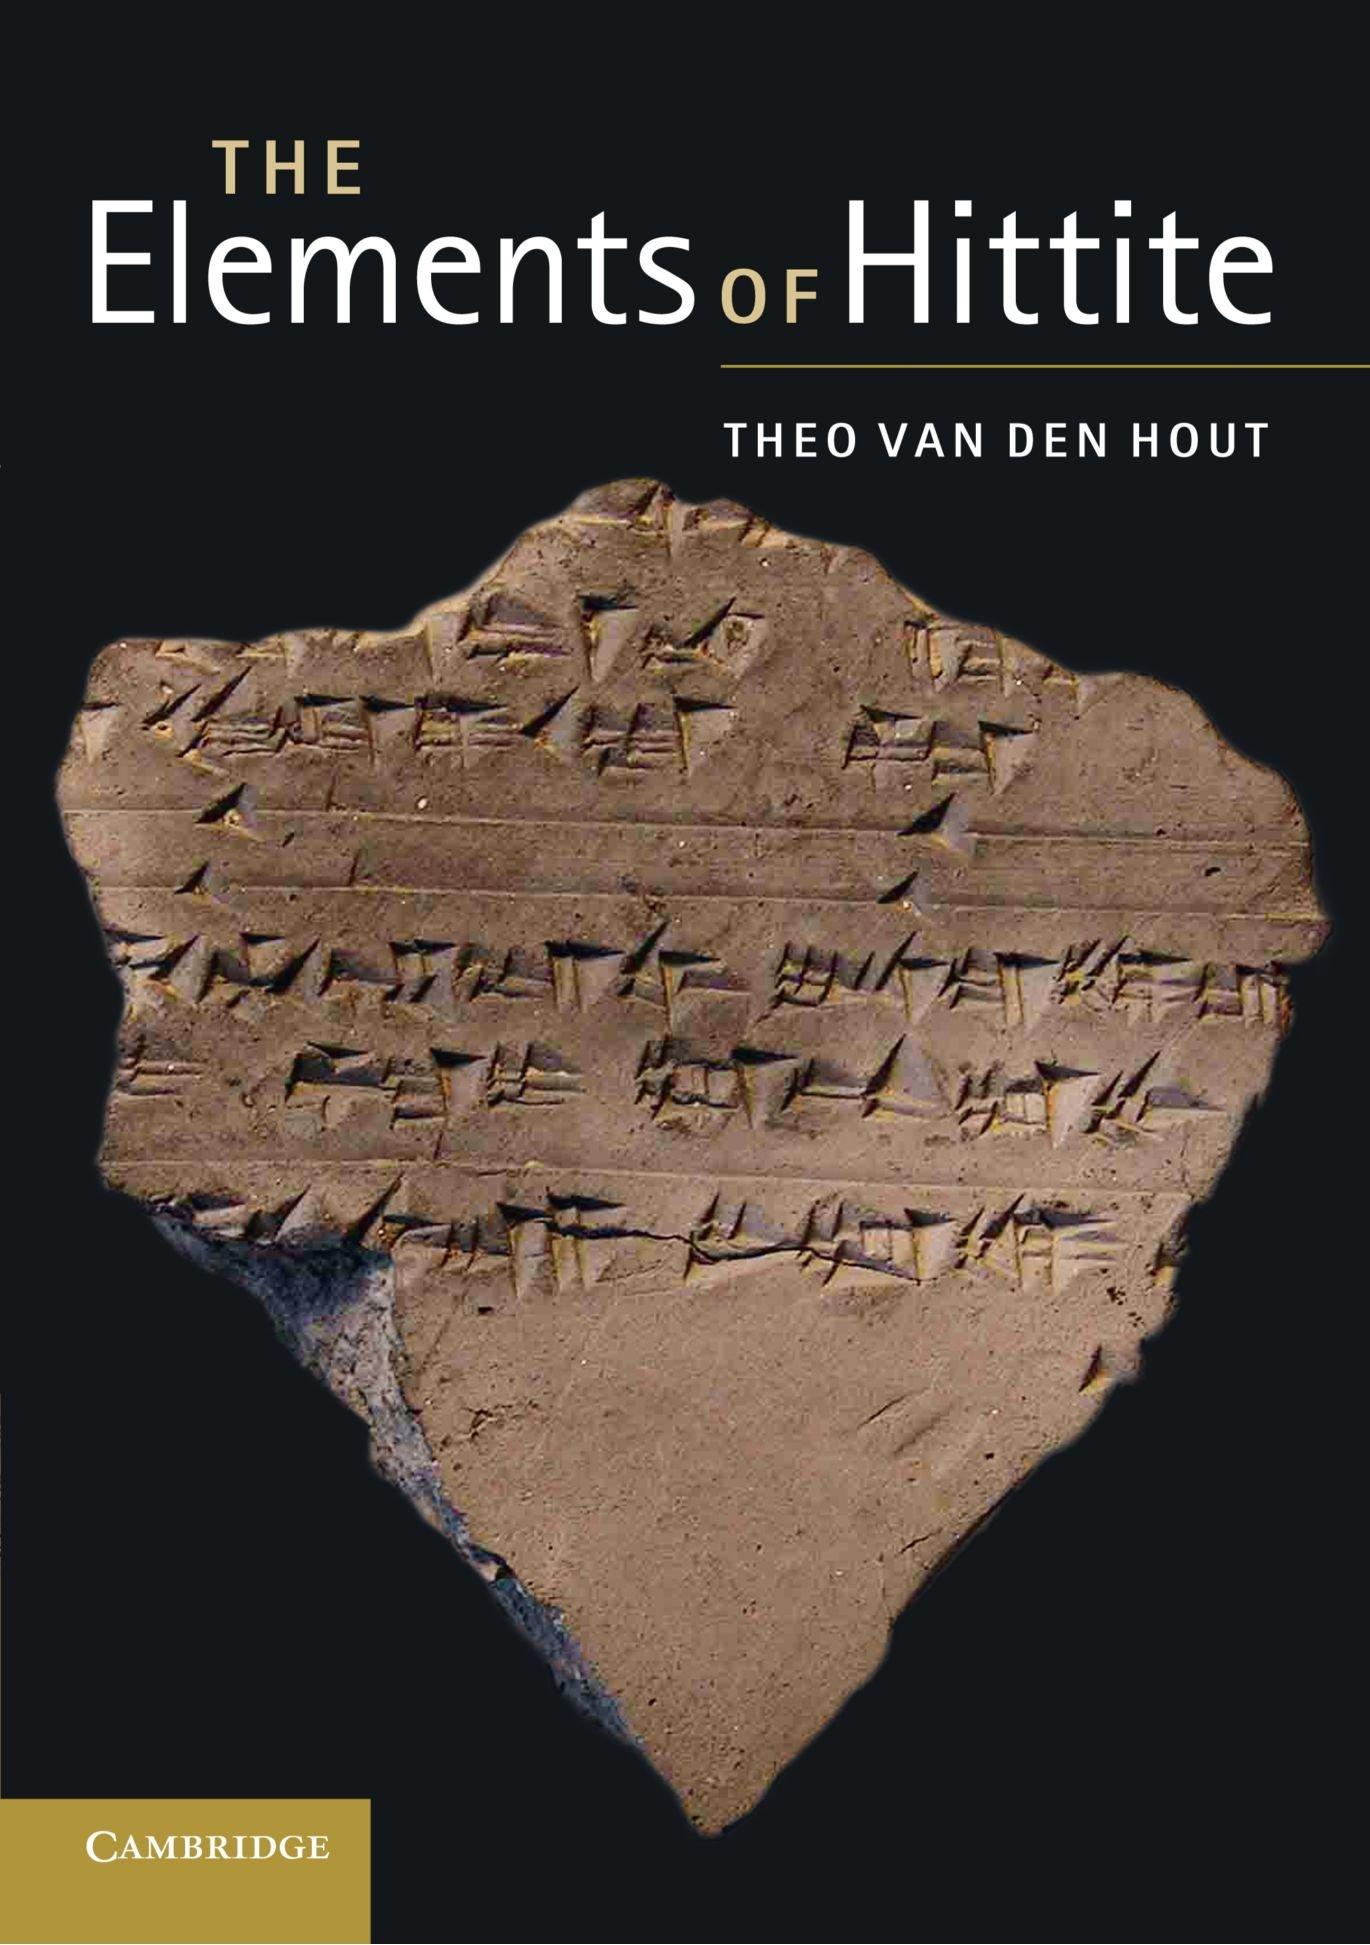 The Elements of Hittite (English and Hittite Edition) by Brand: Cambridge University Press